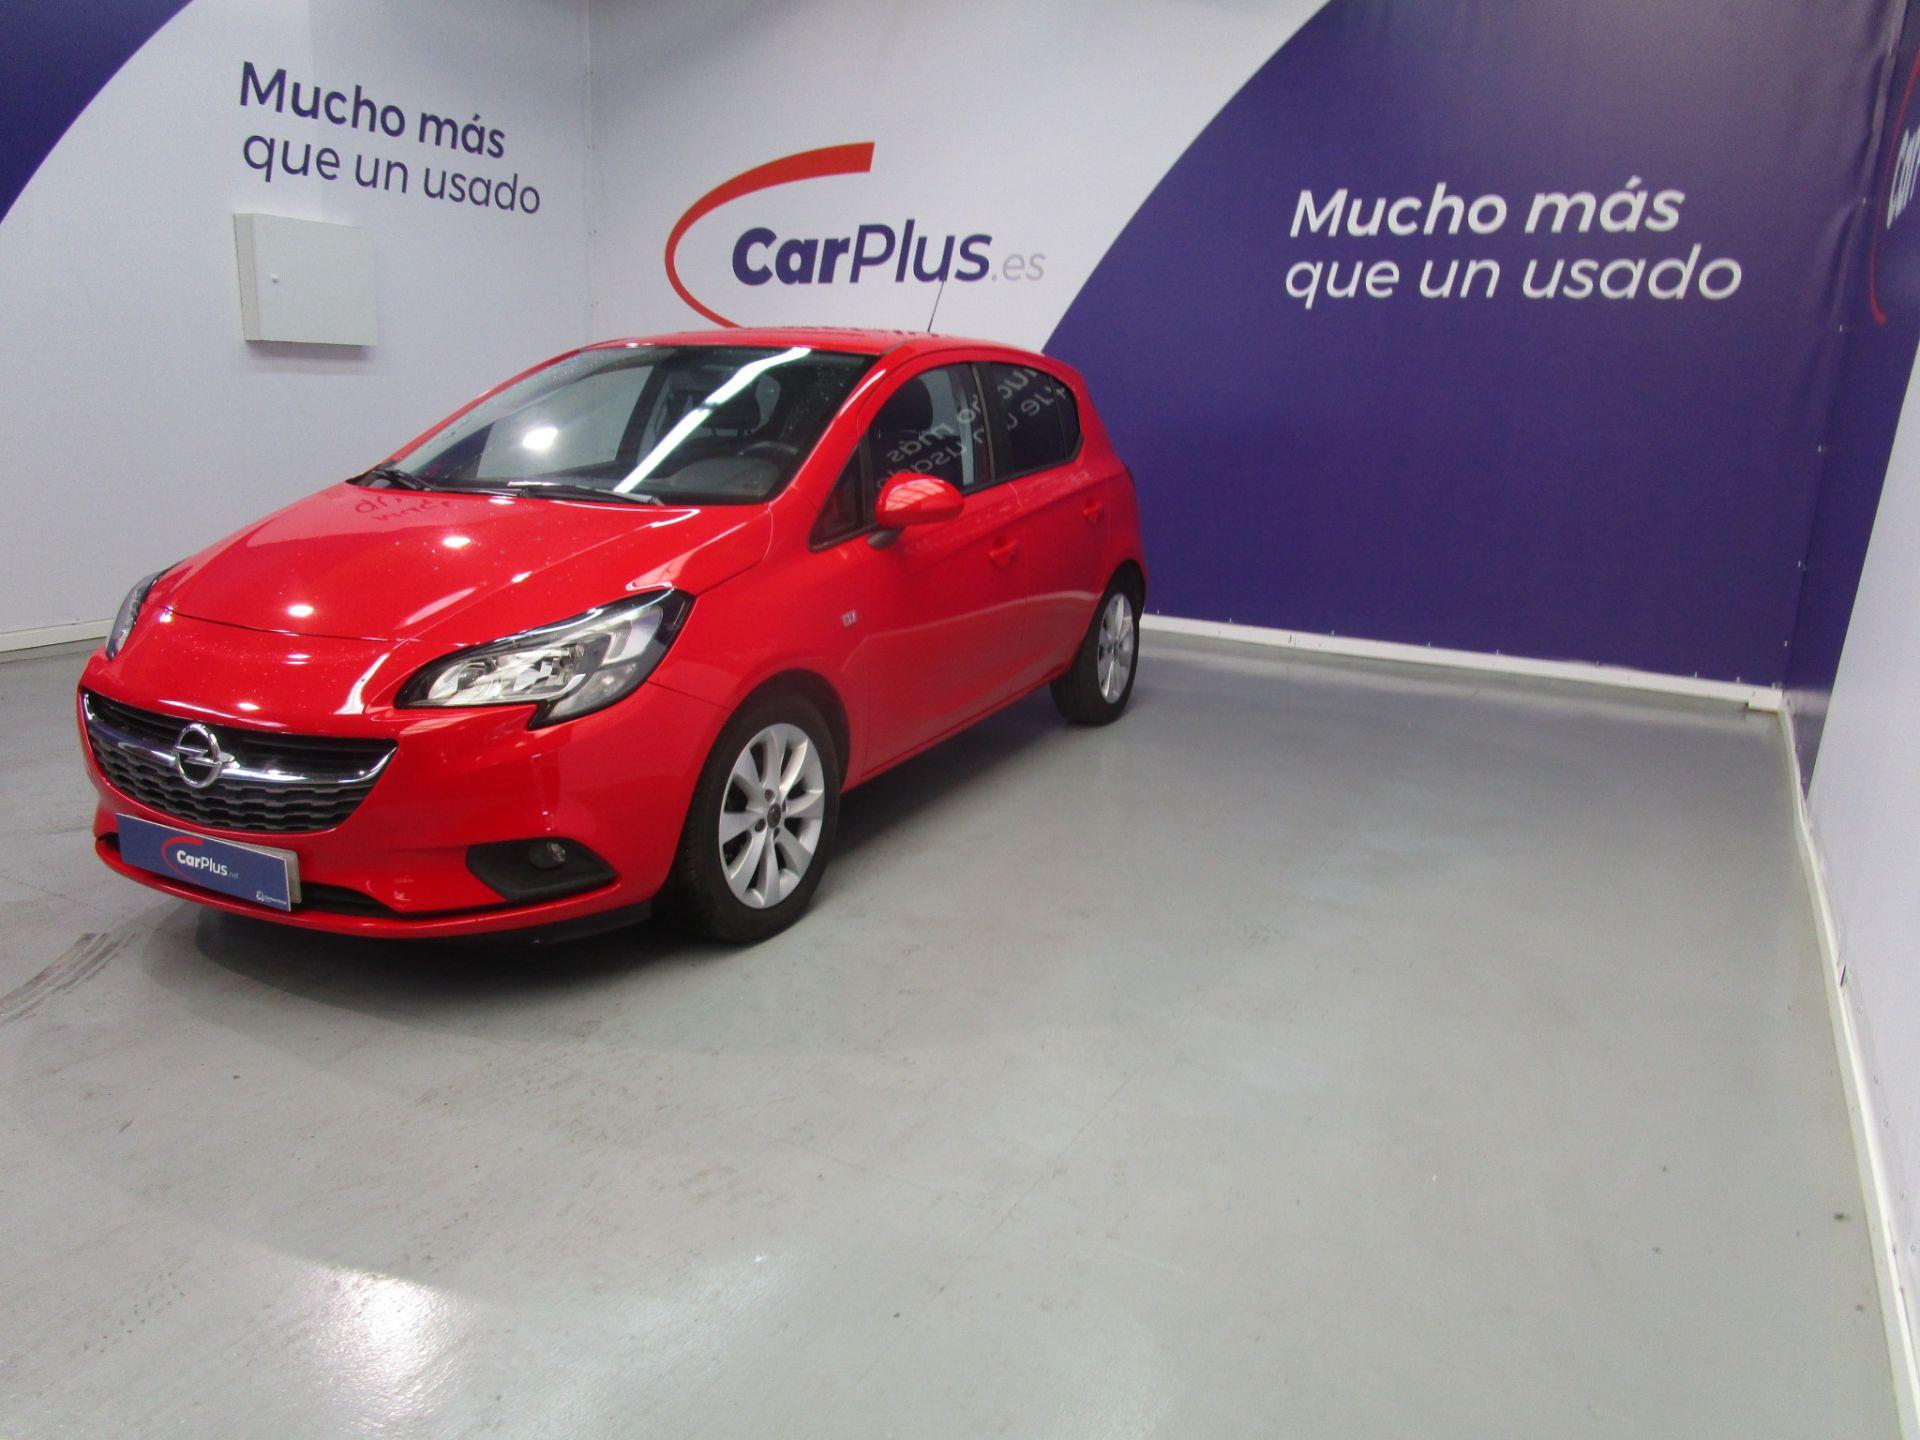 Opel Corsa 1.4 66kW (90CV) Selective GLP segunda mano Madrid